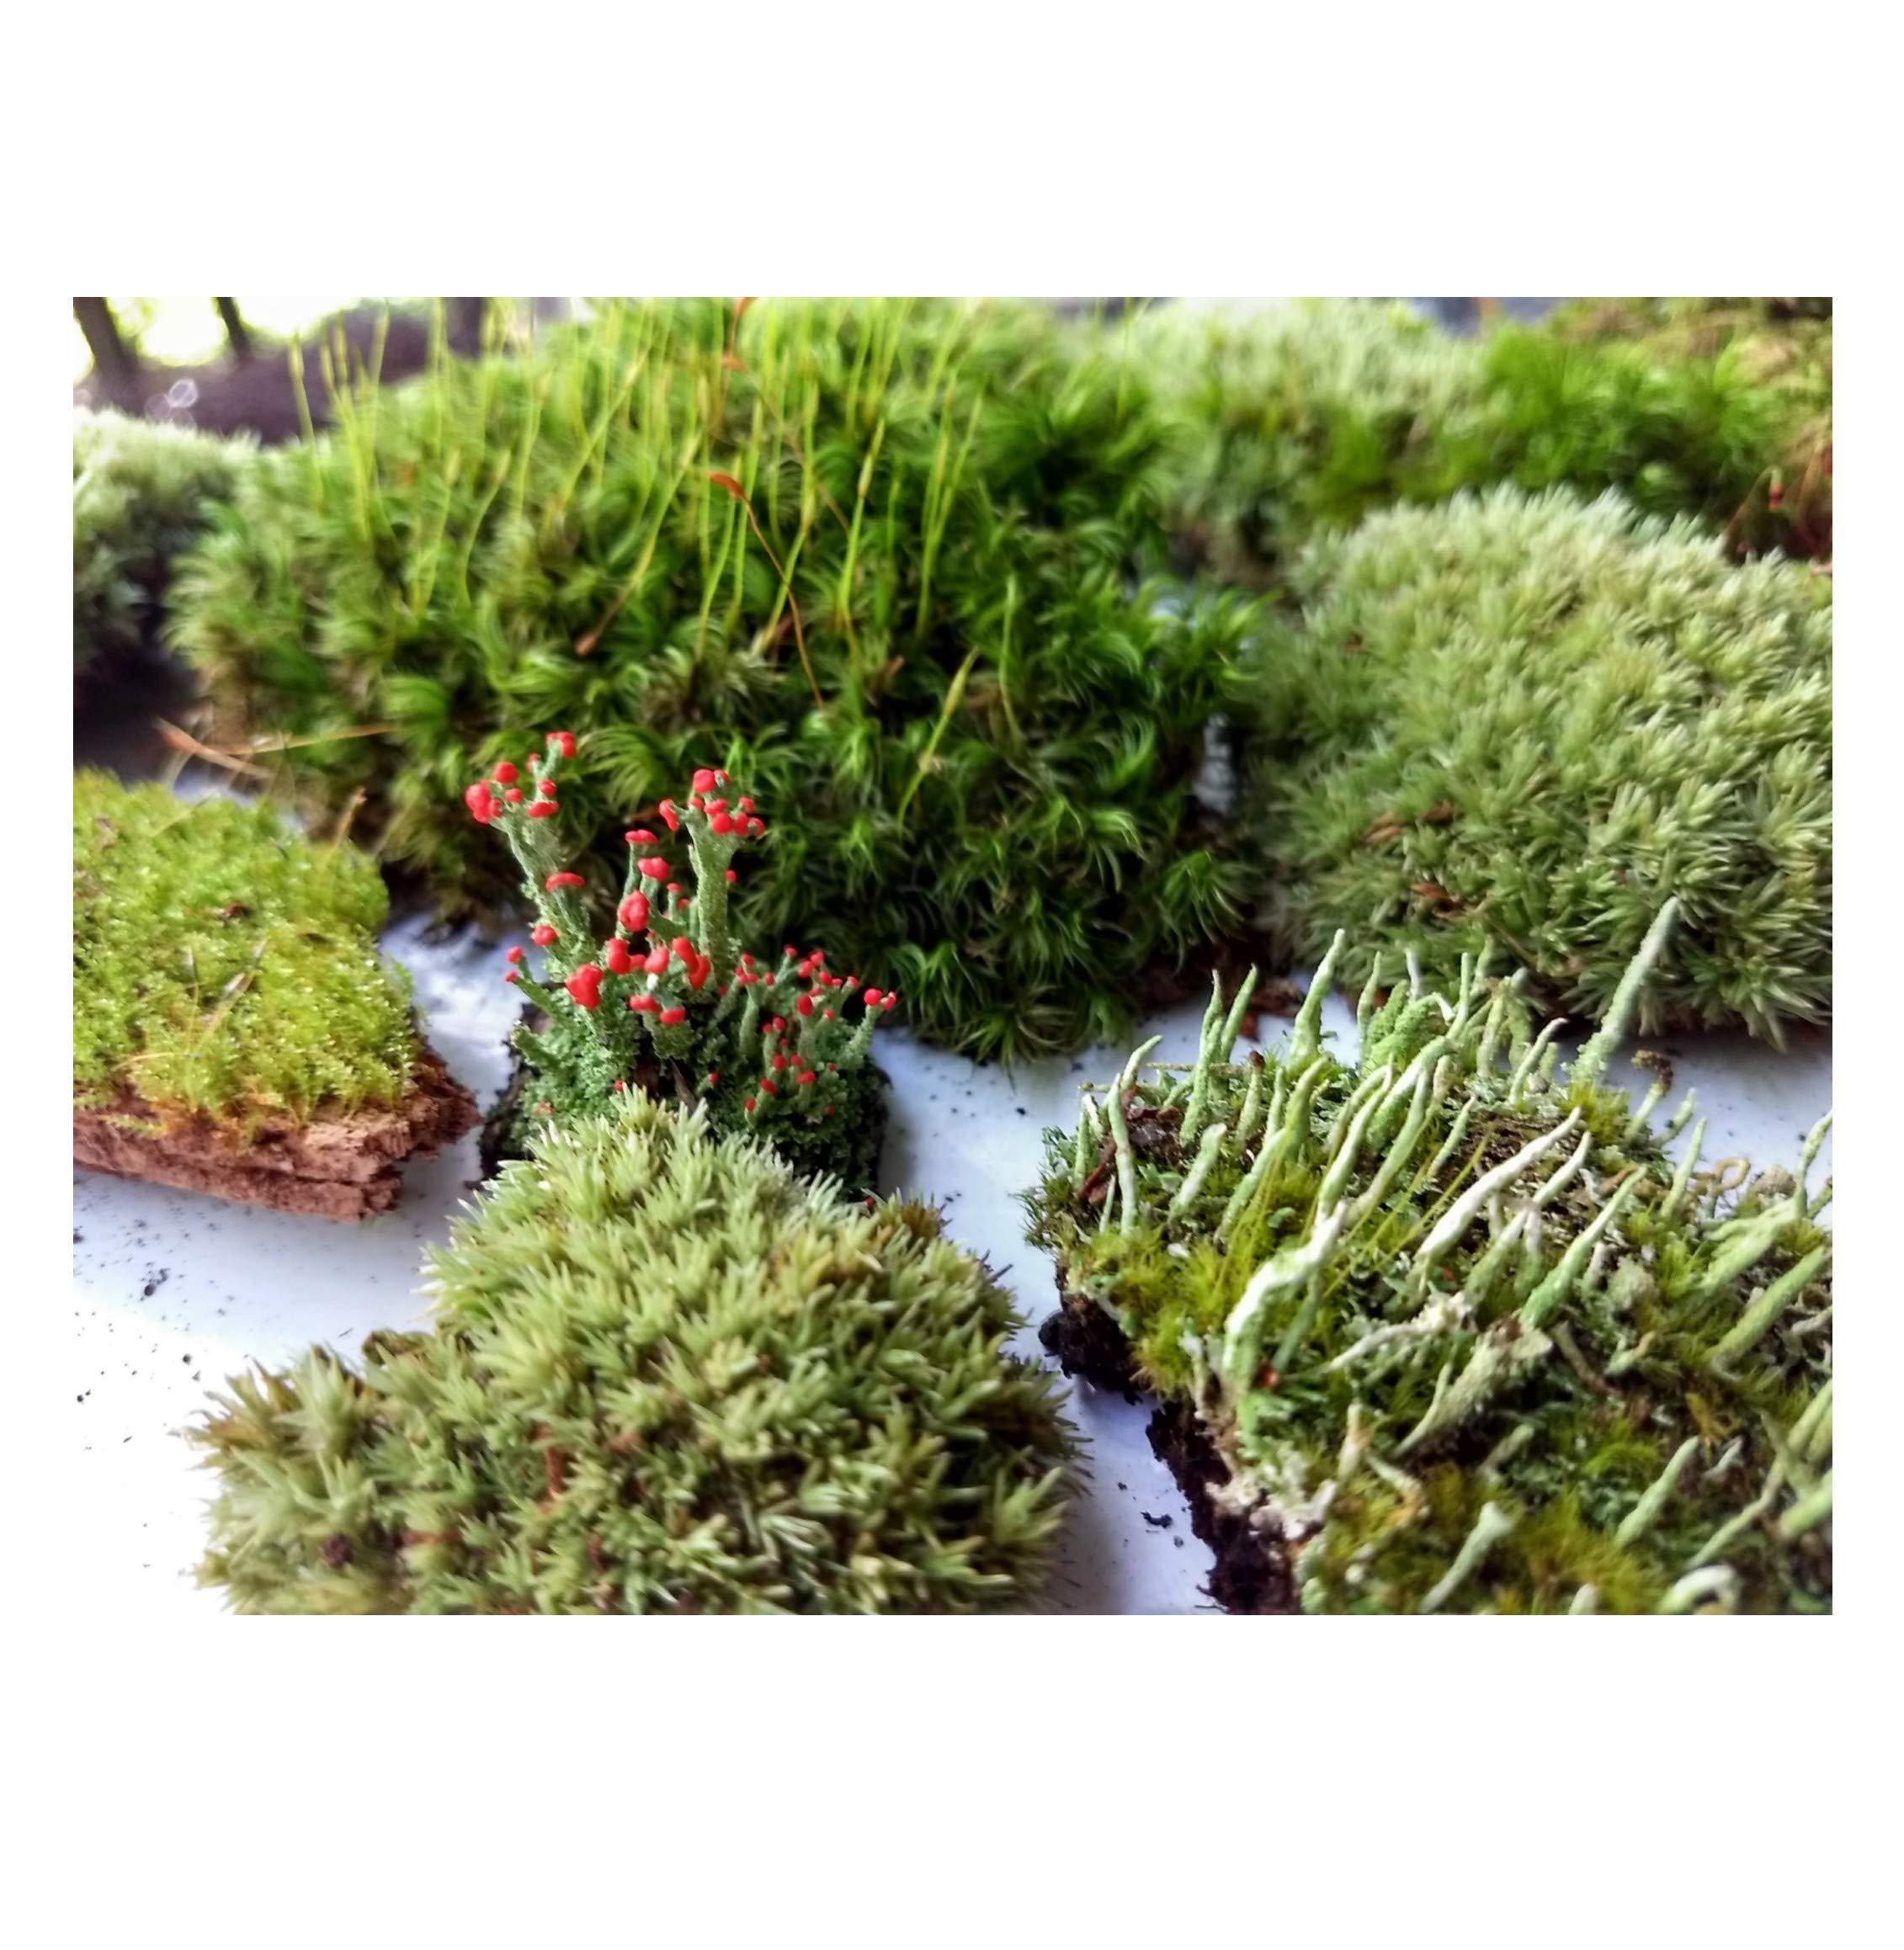 "Tin Roof Treasure Super Fairy Garden Assortment Moss and Lichen for Terrarium, 6""x9"" Bag"